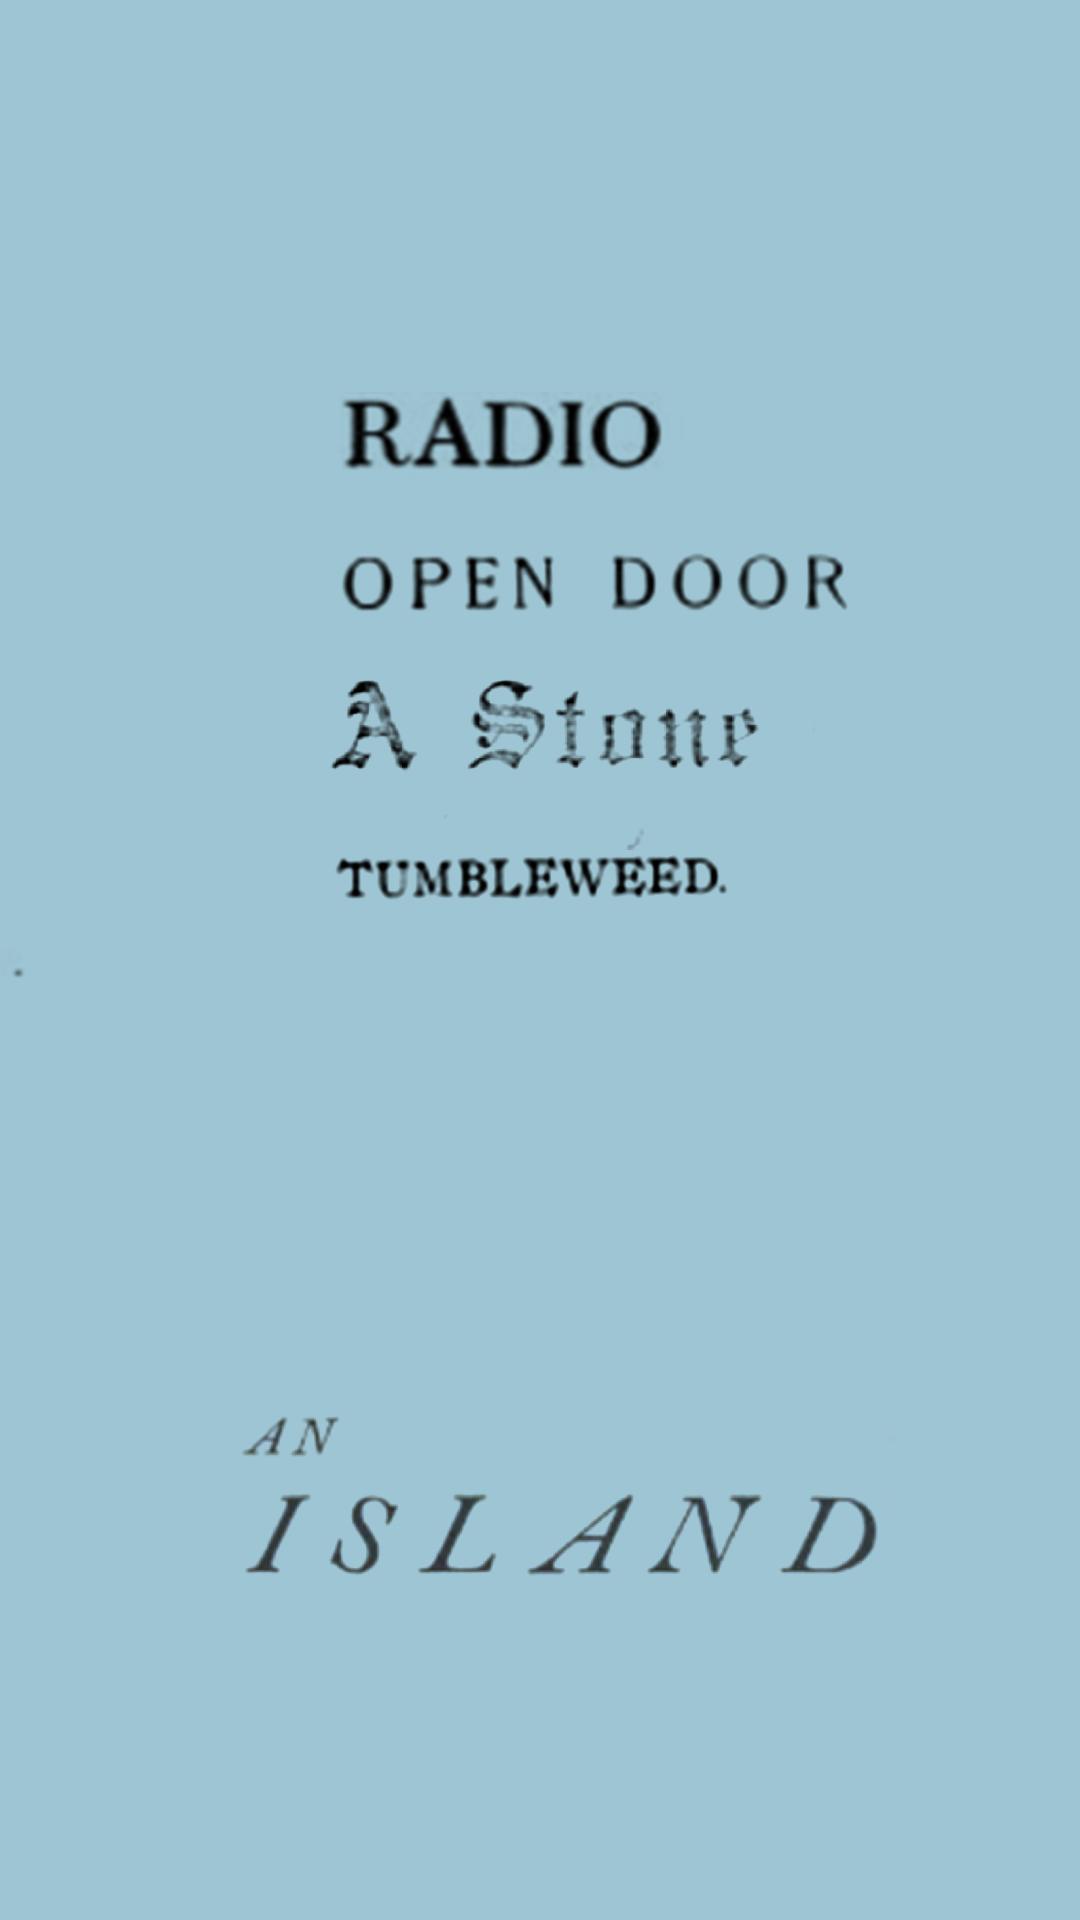 radiotoisland.jpg